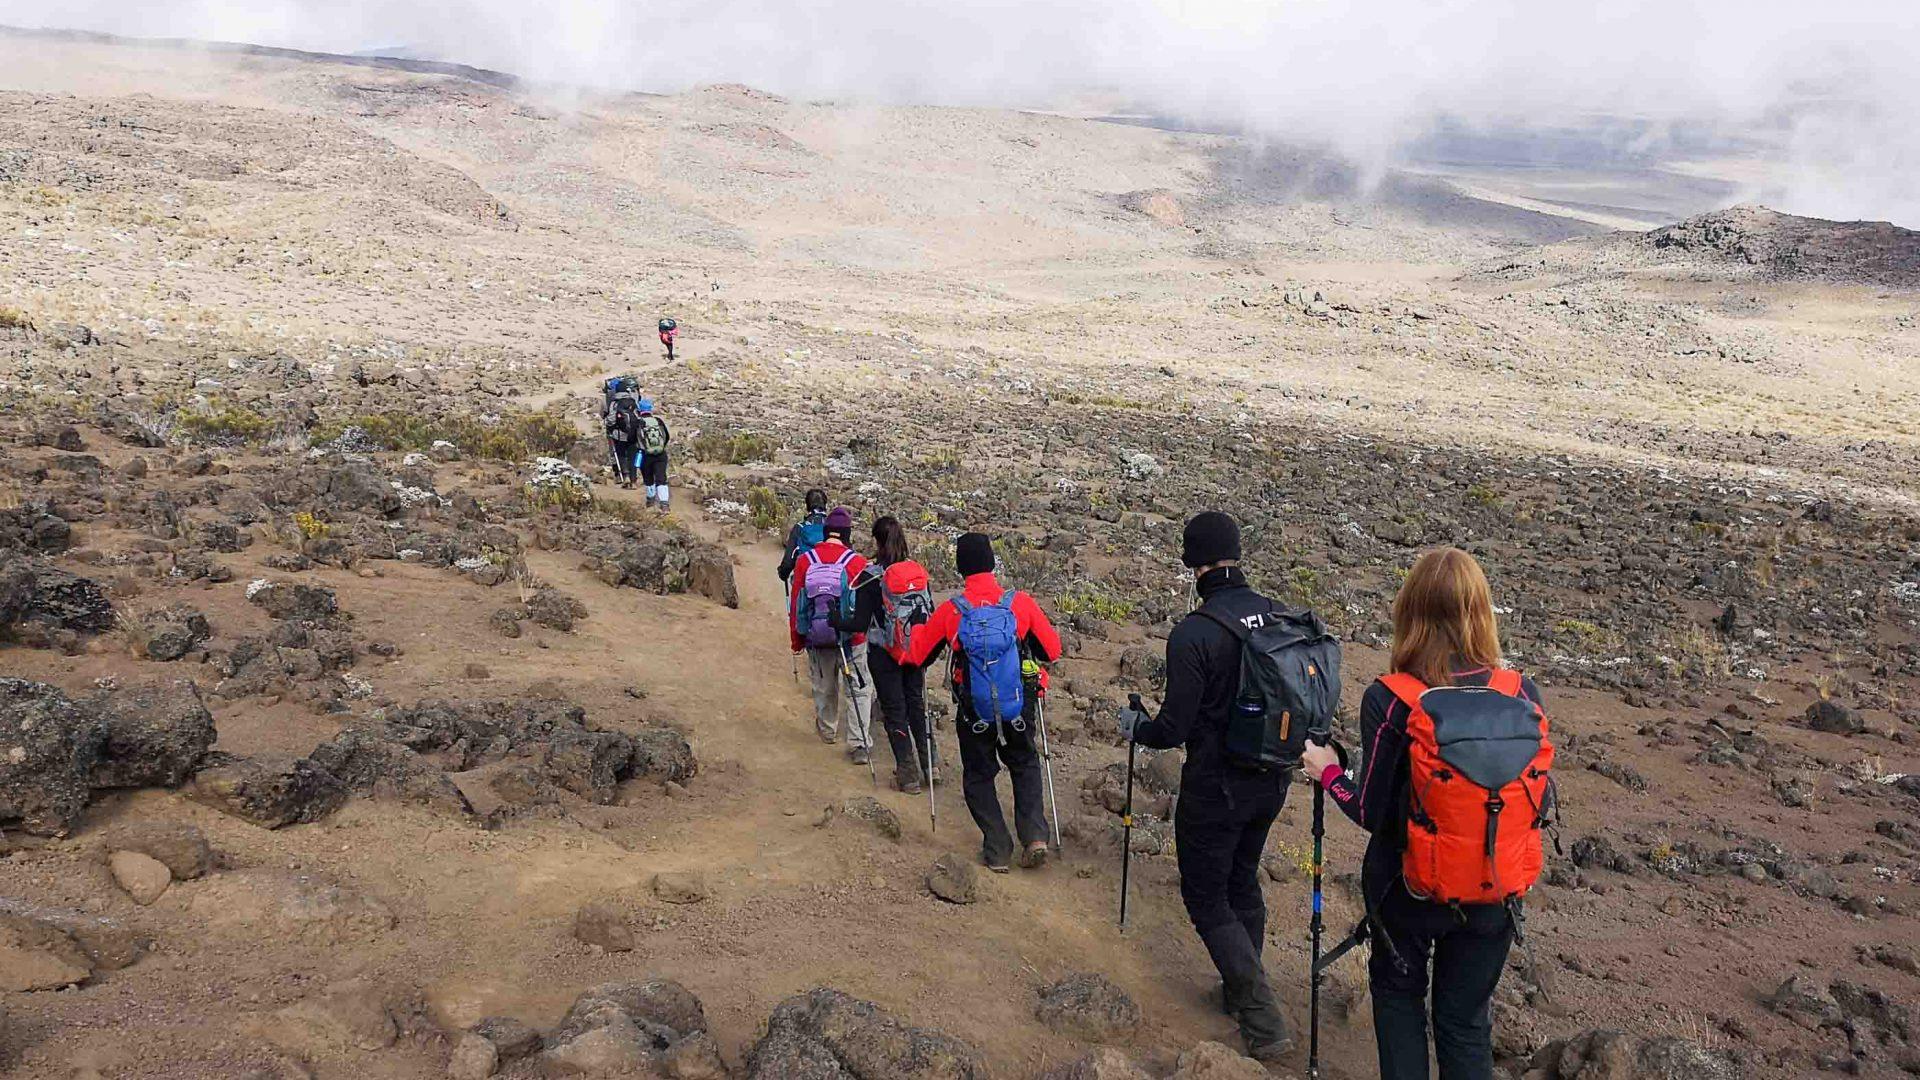 Hikers walking up an arid, barren part of the mountain.